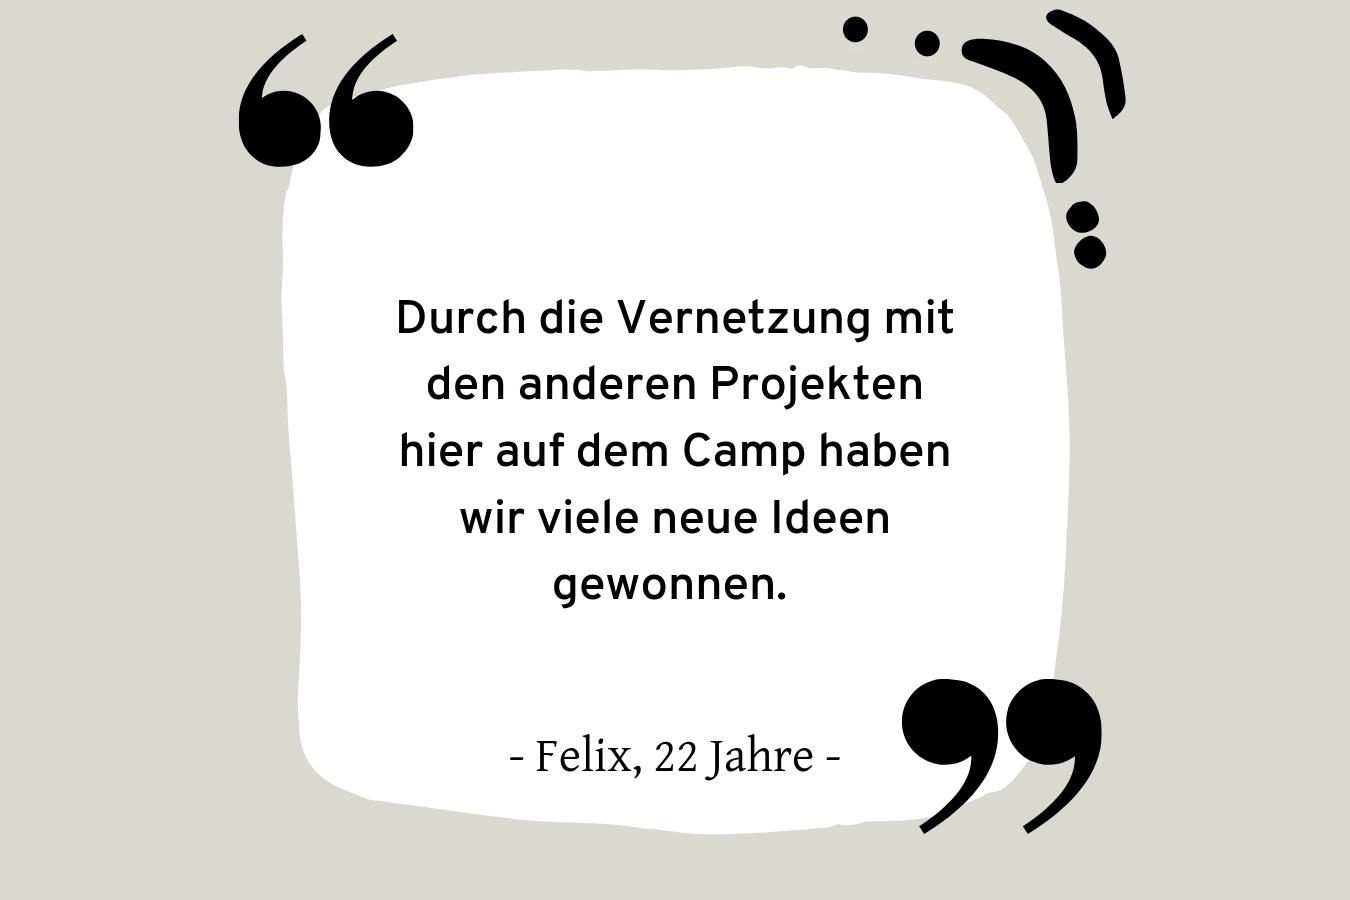 Zitat_Bildergalerie_Jugend_hilft!_Camp_2019 (22).png